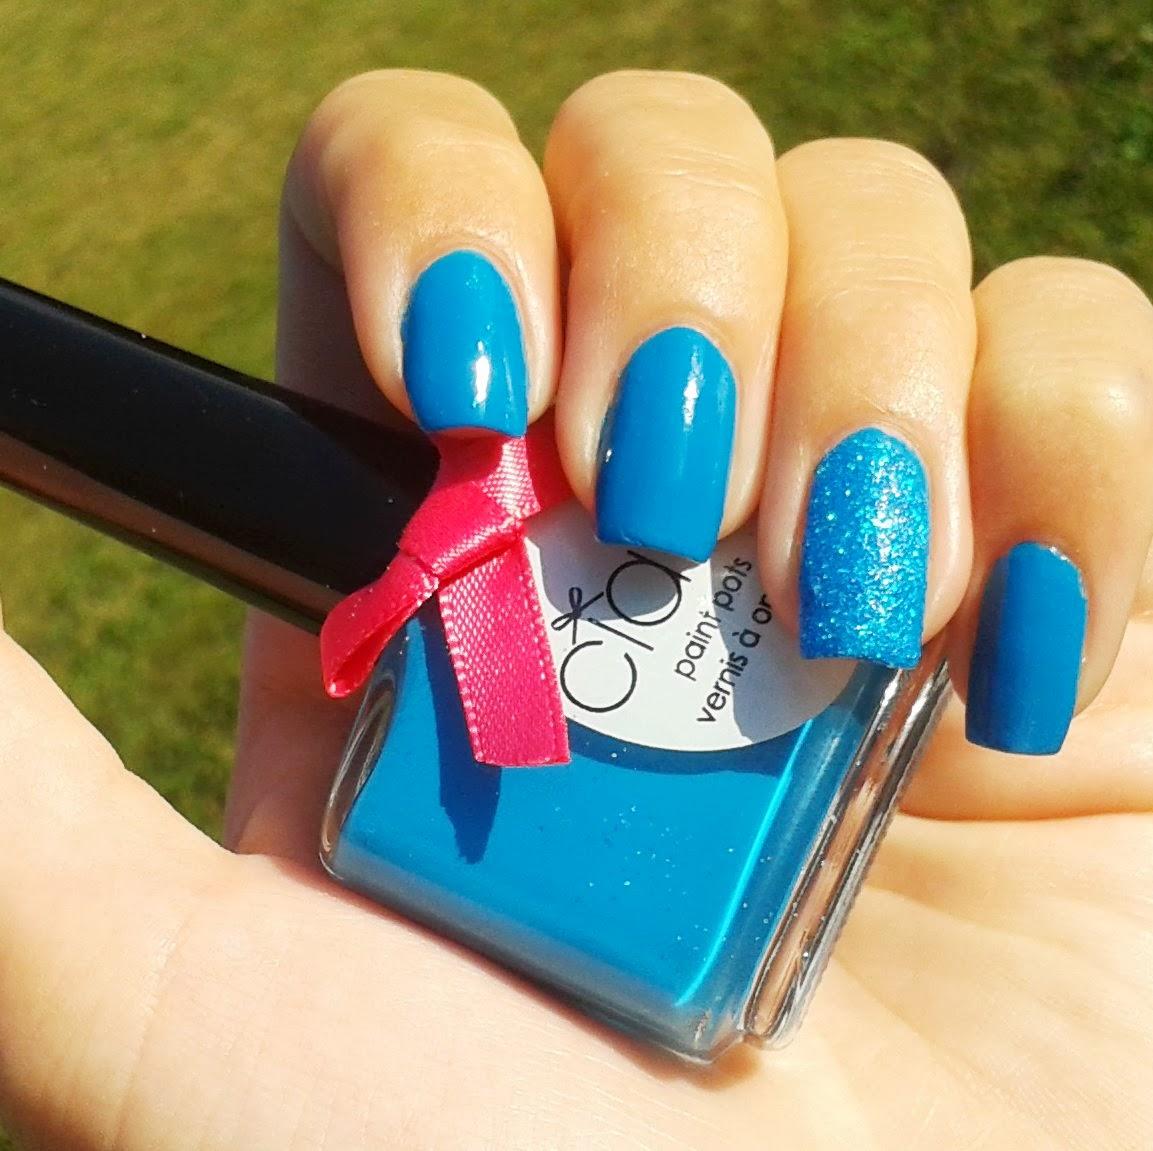 Ciaté Corrupted Neon Blue Manicure 3D Glitter Nail Polish Kit Glows ...